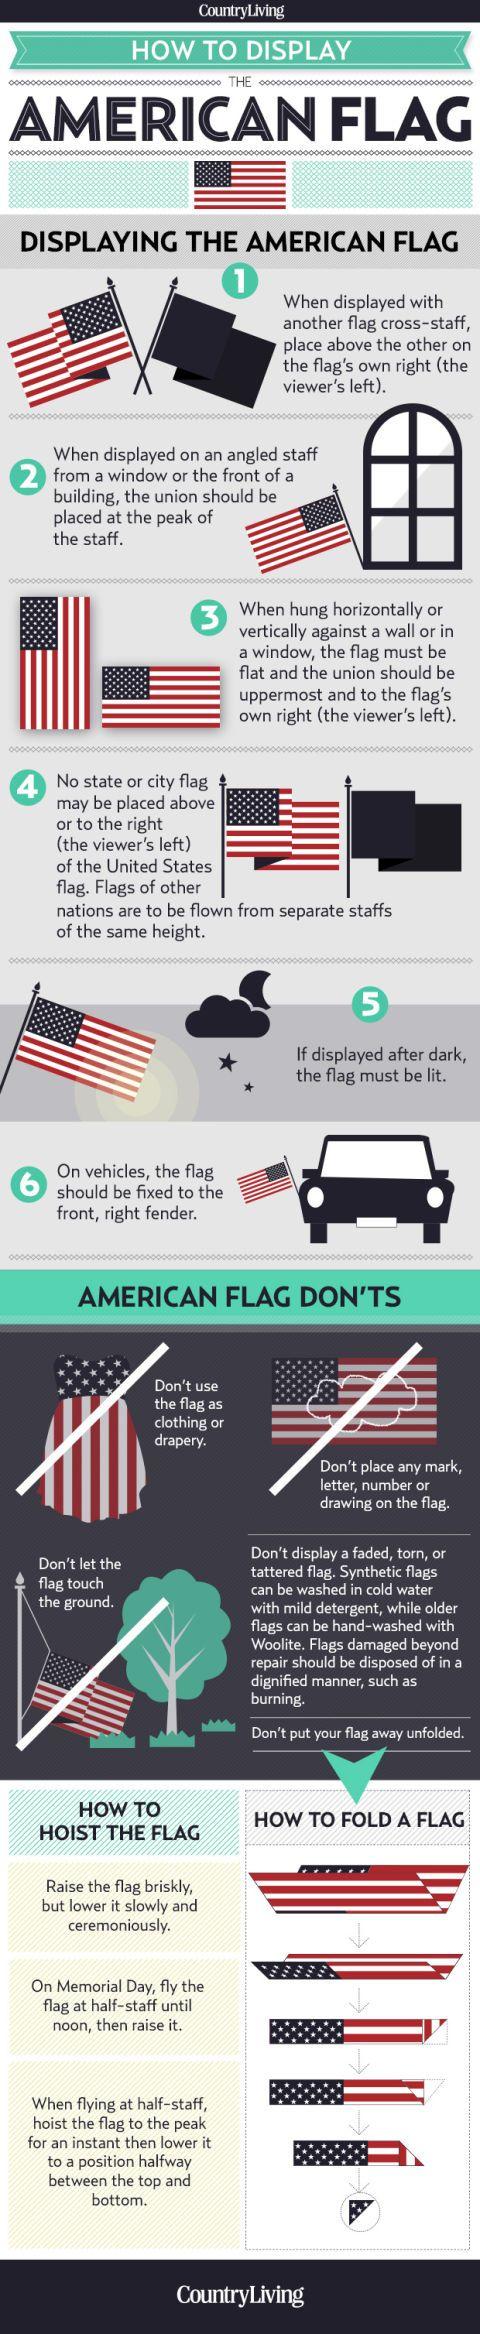 07a4ddbdde4f American Flag Etiquette - Displaying the American Flag